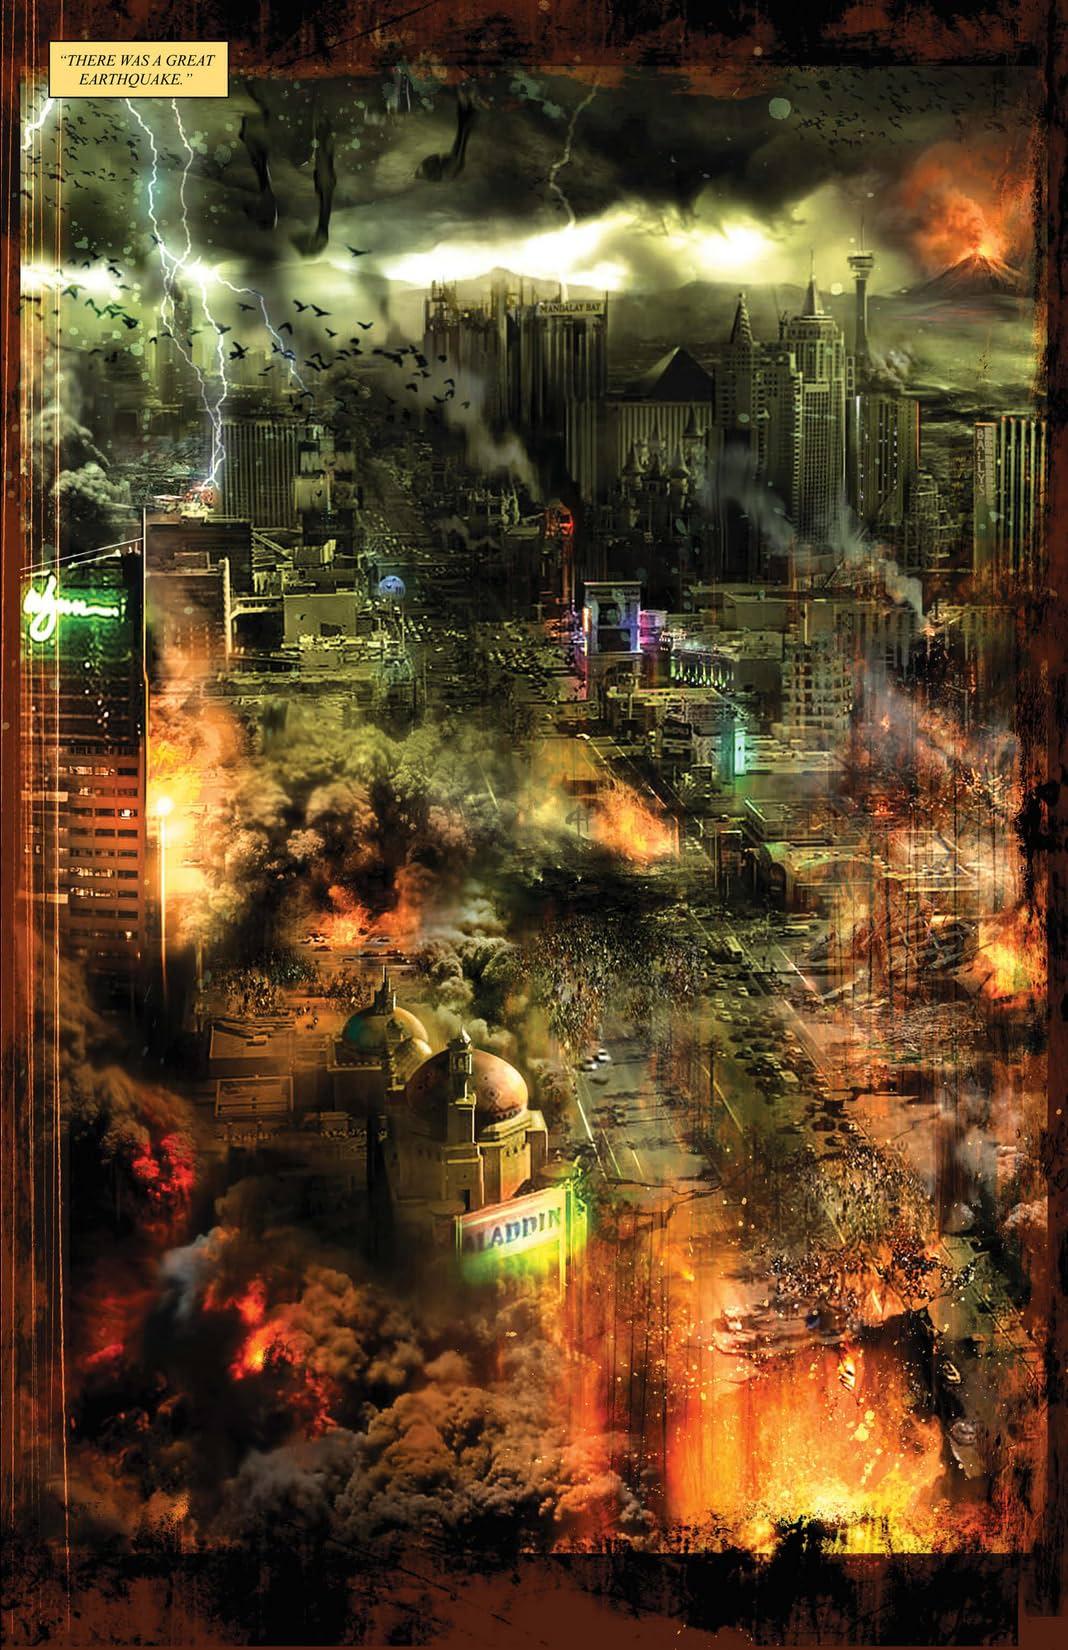 Four Horsemen of the Apocalypse #7 (of 9): Resurrection